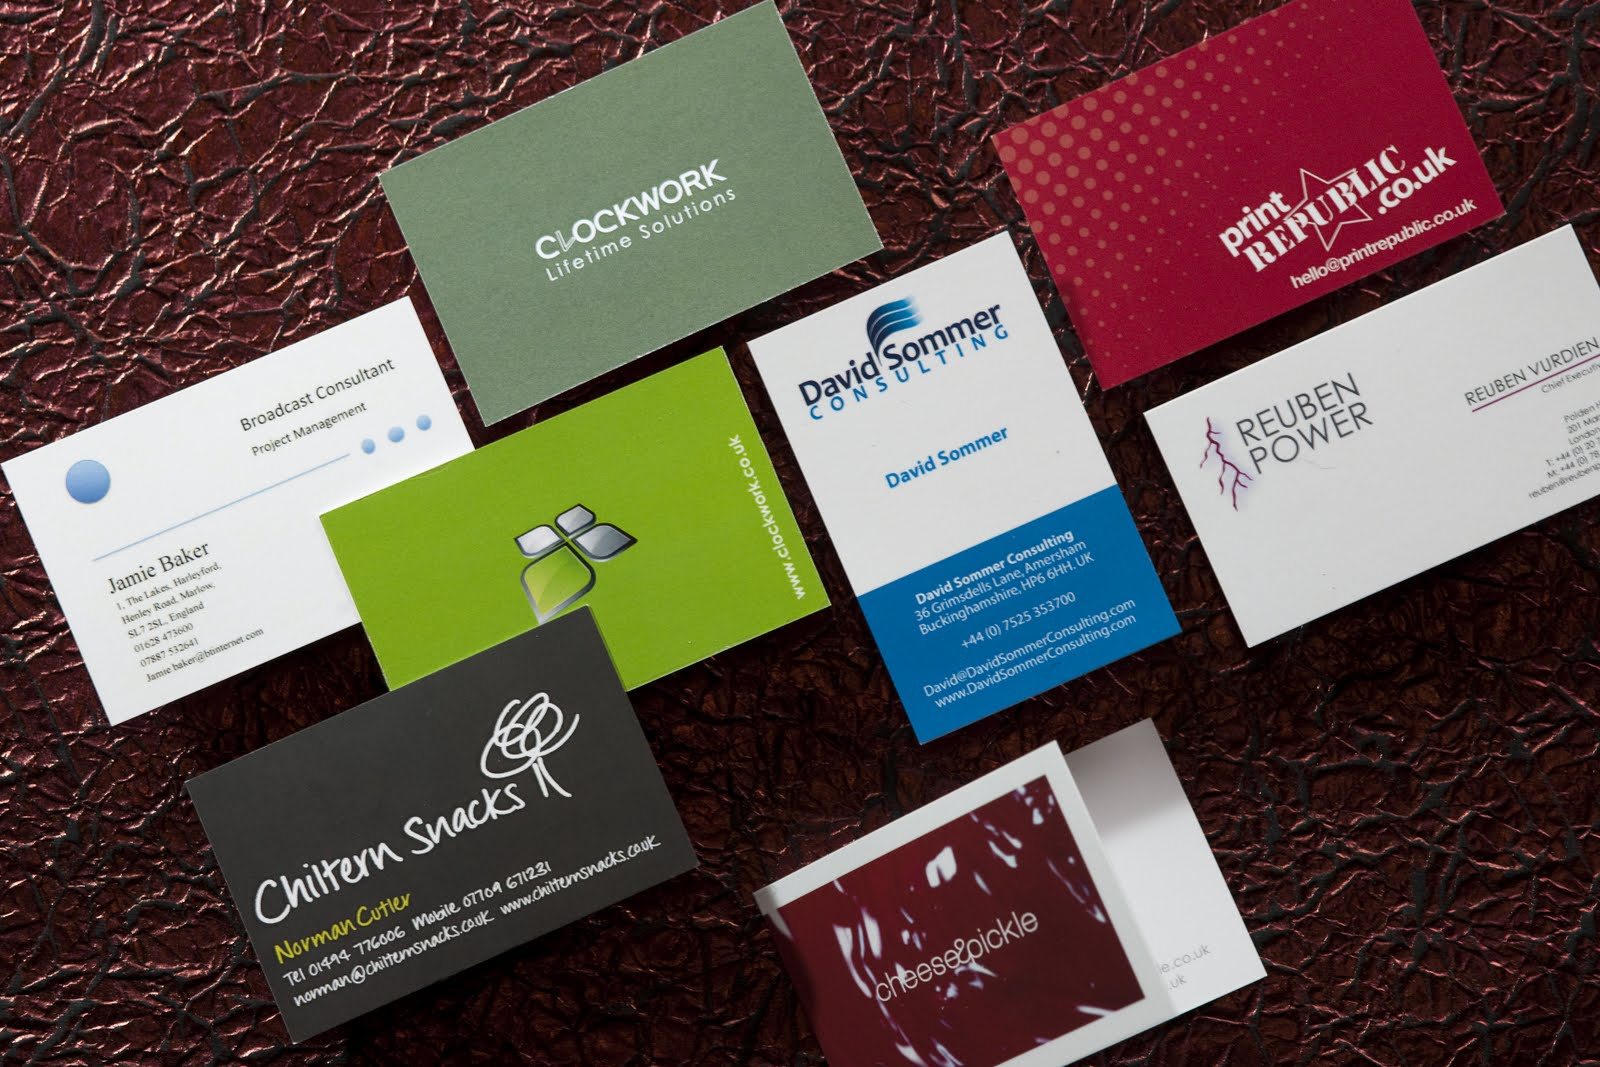 Business card printing in dubai marina gallery card design and business card printing dubai deira choice image card design and business card printing company in dubai reheart Images